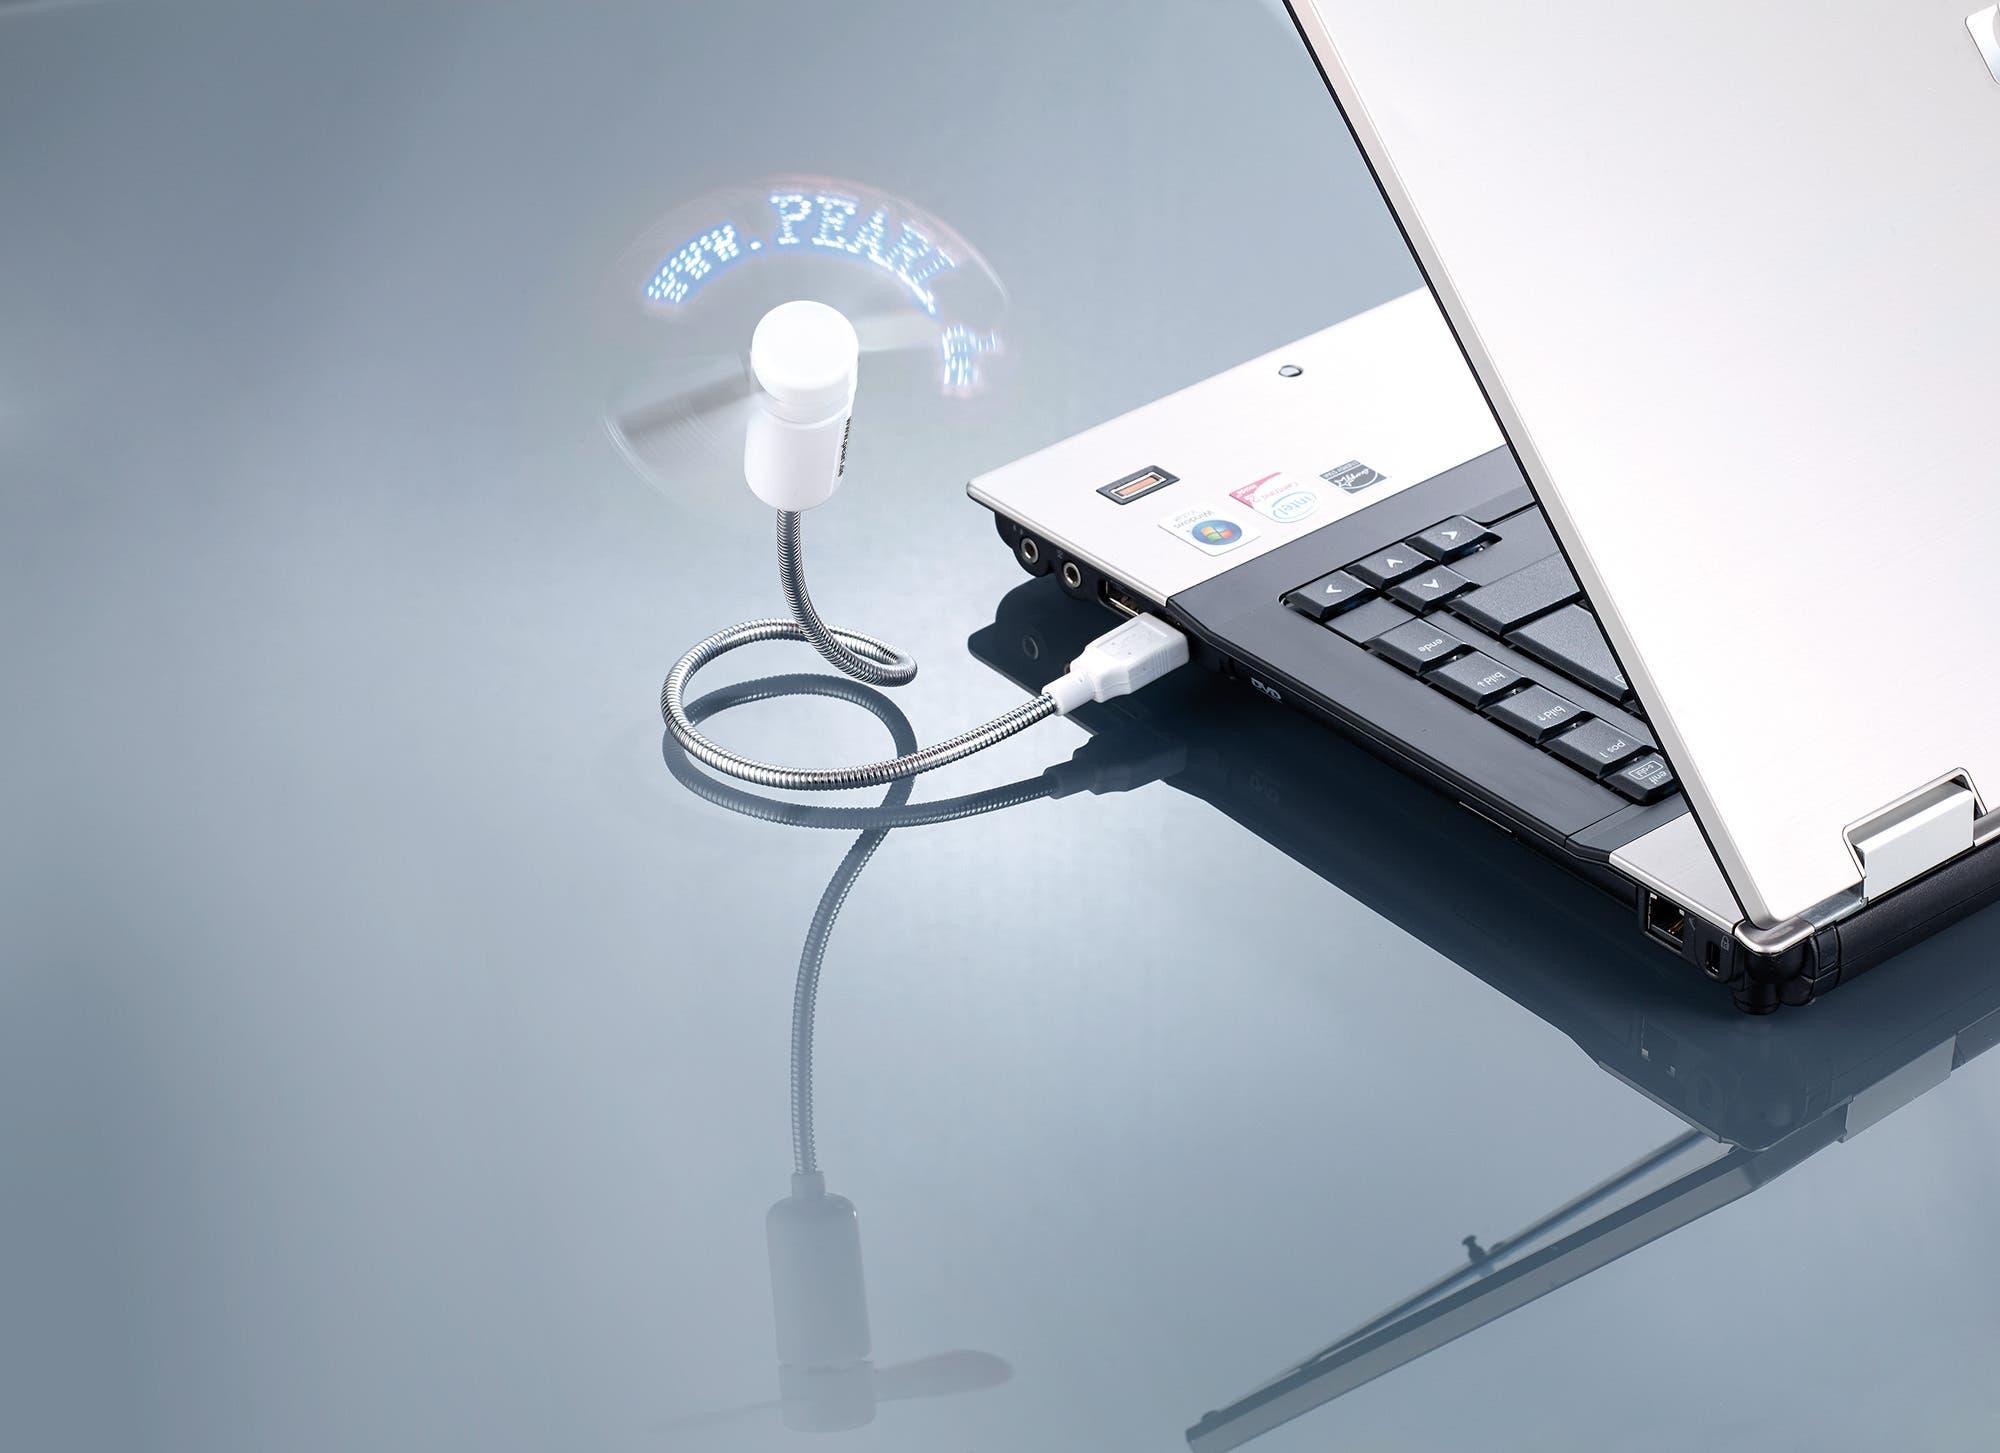 PX-5939 3 PEARL USB-Ventilator mit programmierbarer Laufschrift